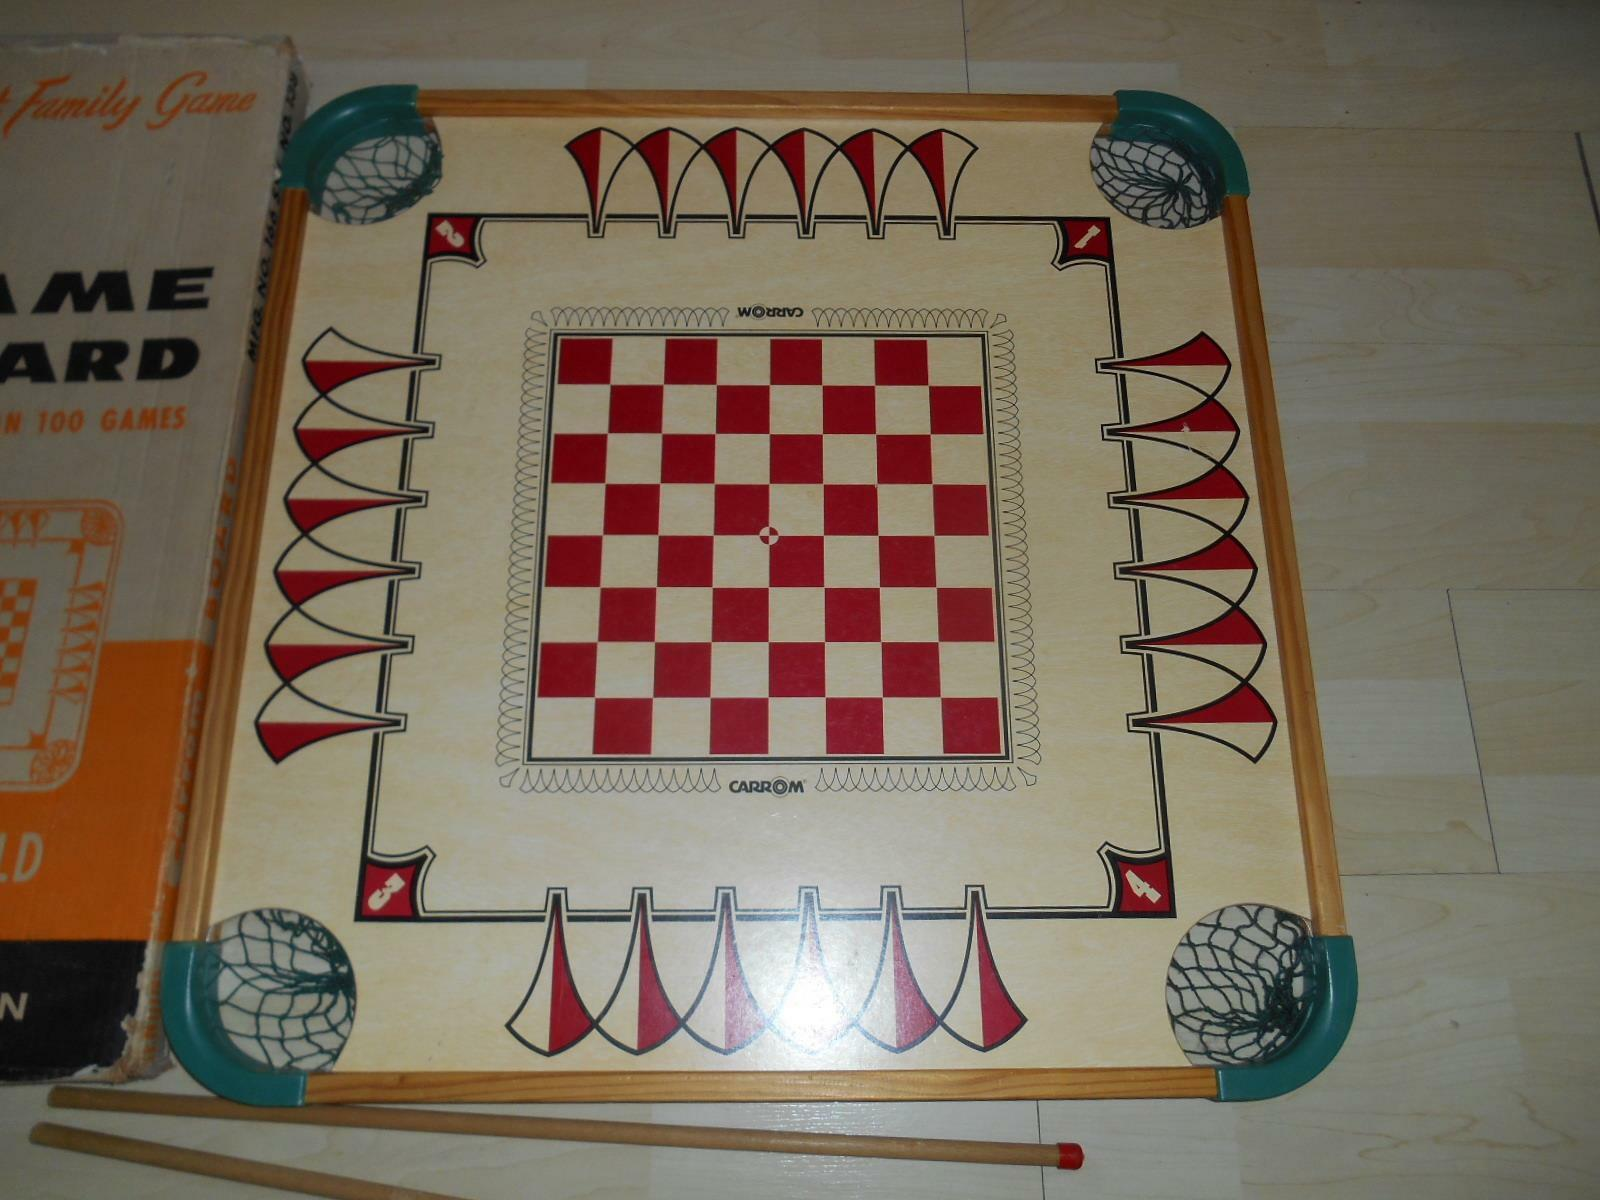 Old Vtg Genuine autoROM gioco tavola 2 Sticks Wtutti Art Decor No Pieces giocotavola